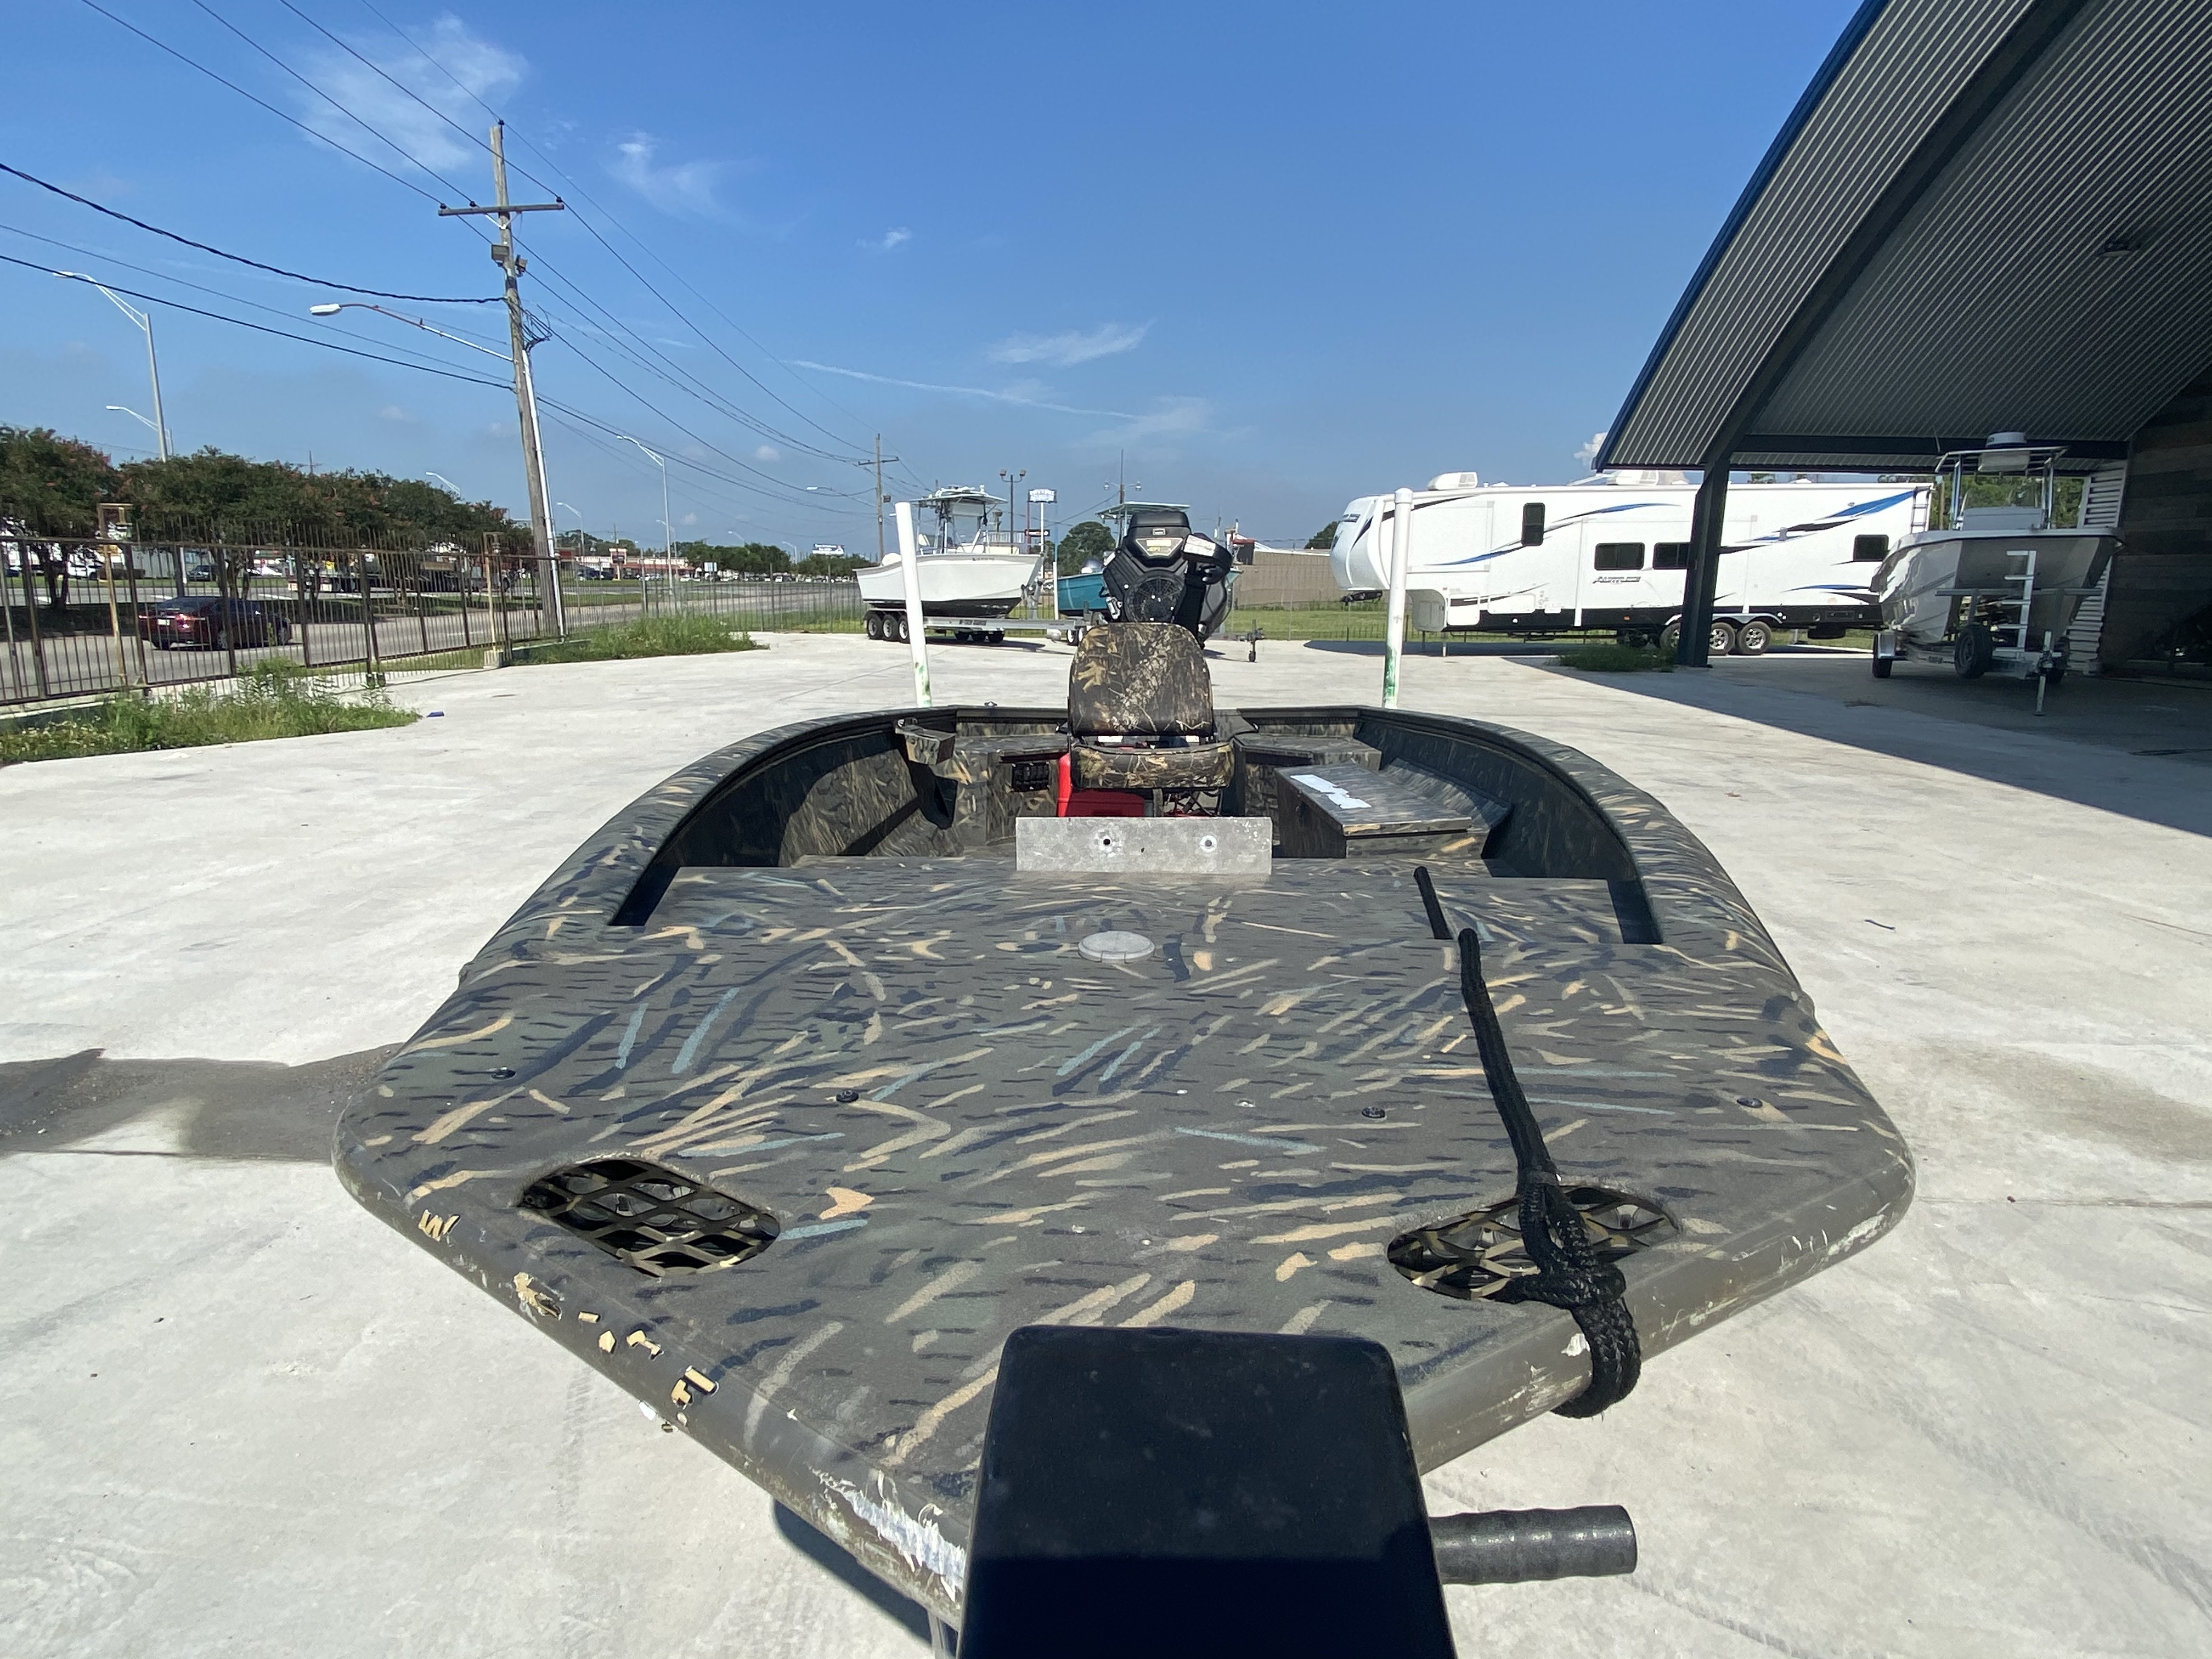 2020 War Eagle boat for sale, model of the boat is Gladiator 750 & Image # 4 of 11